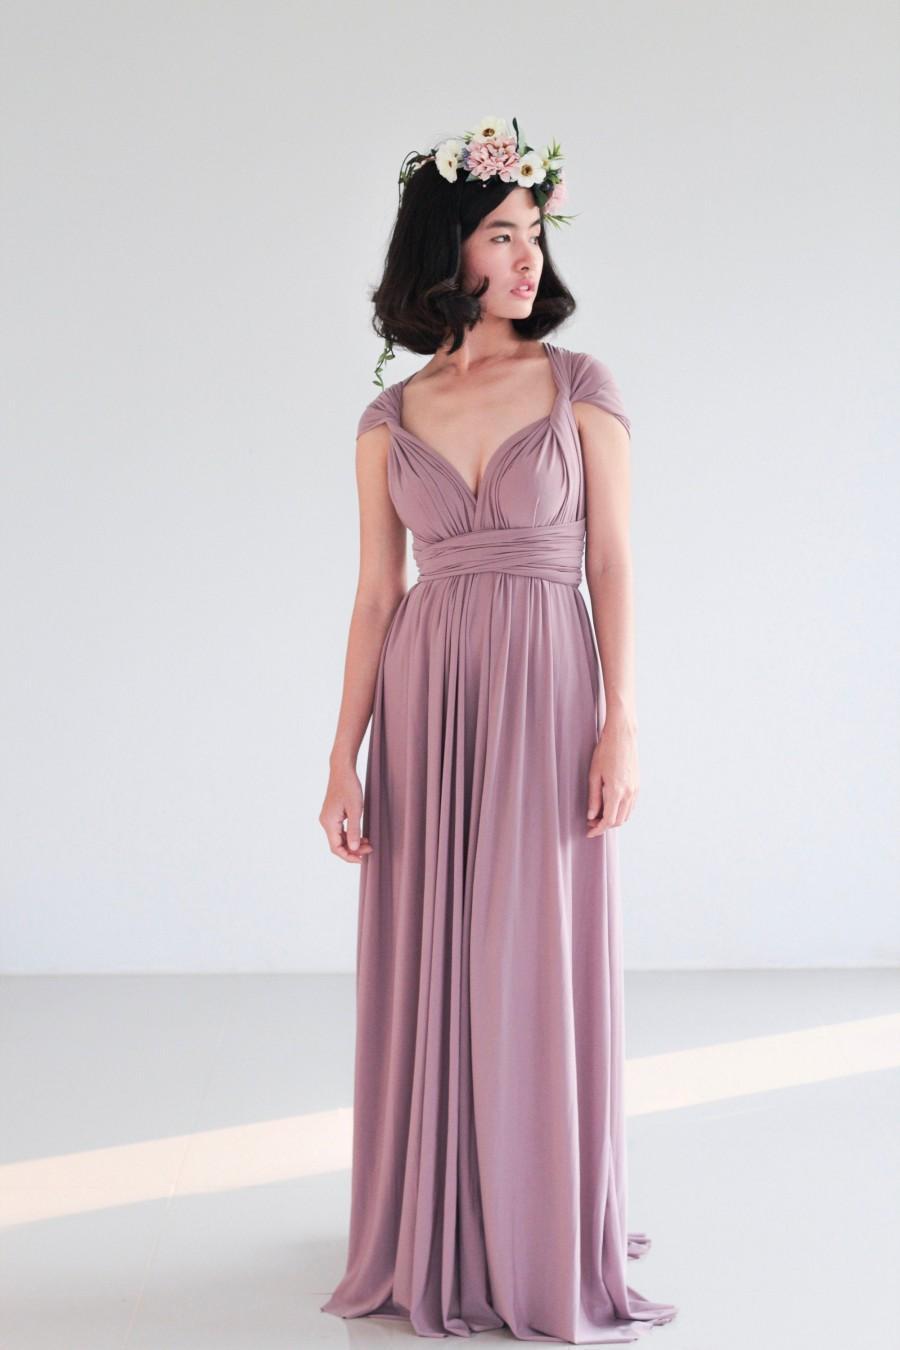 Wedding - Infinity Dress, Mauve purple Infinity Dress, Bridesmaid Dress, Prom Dress, Convertible Dress, Wrap Dress